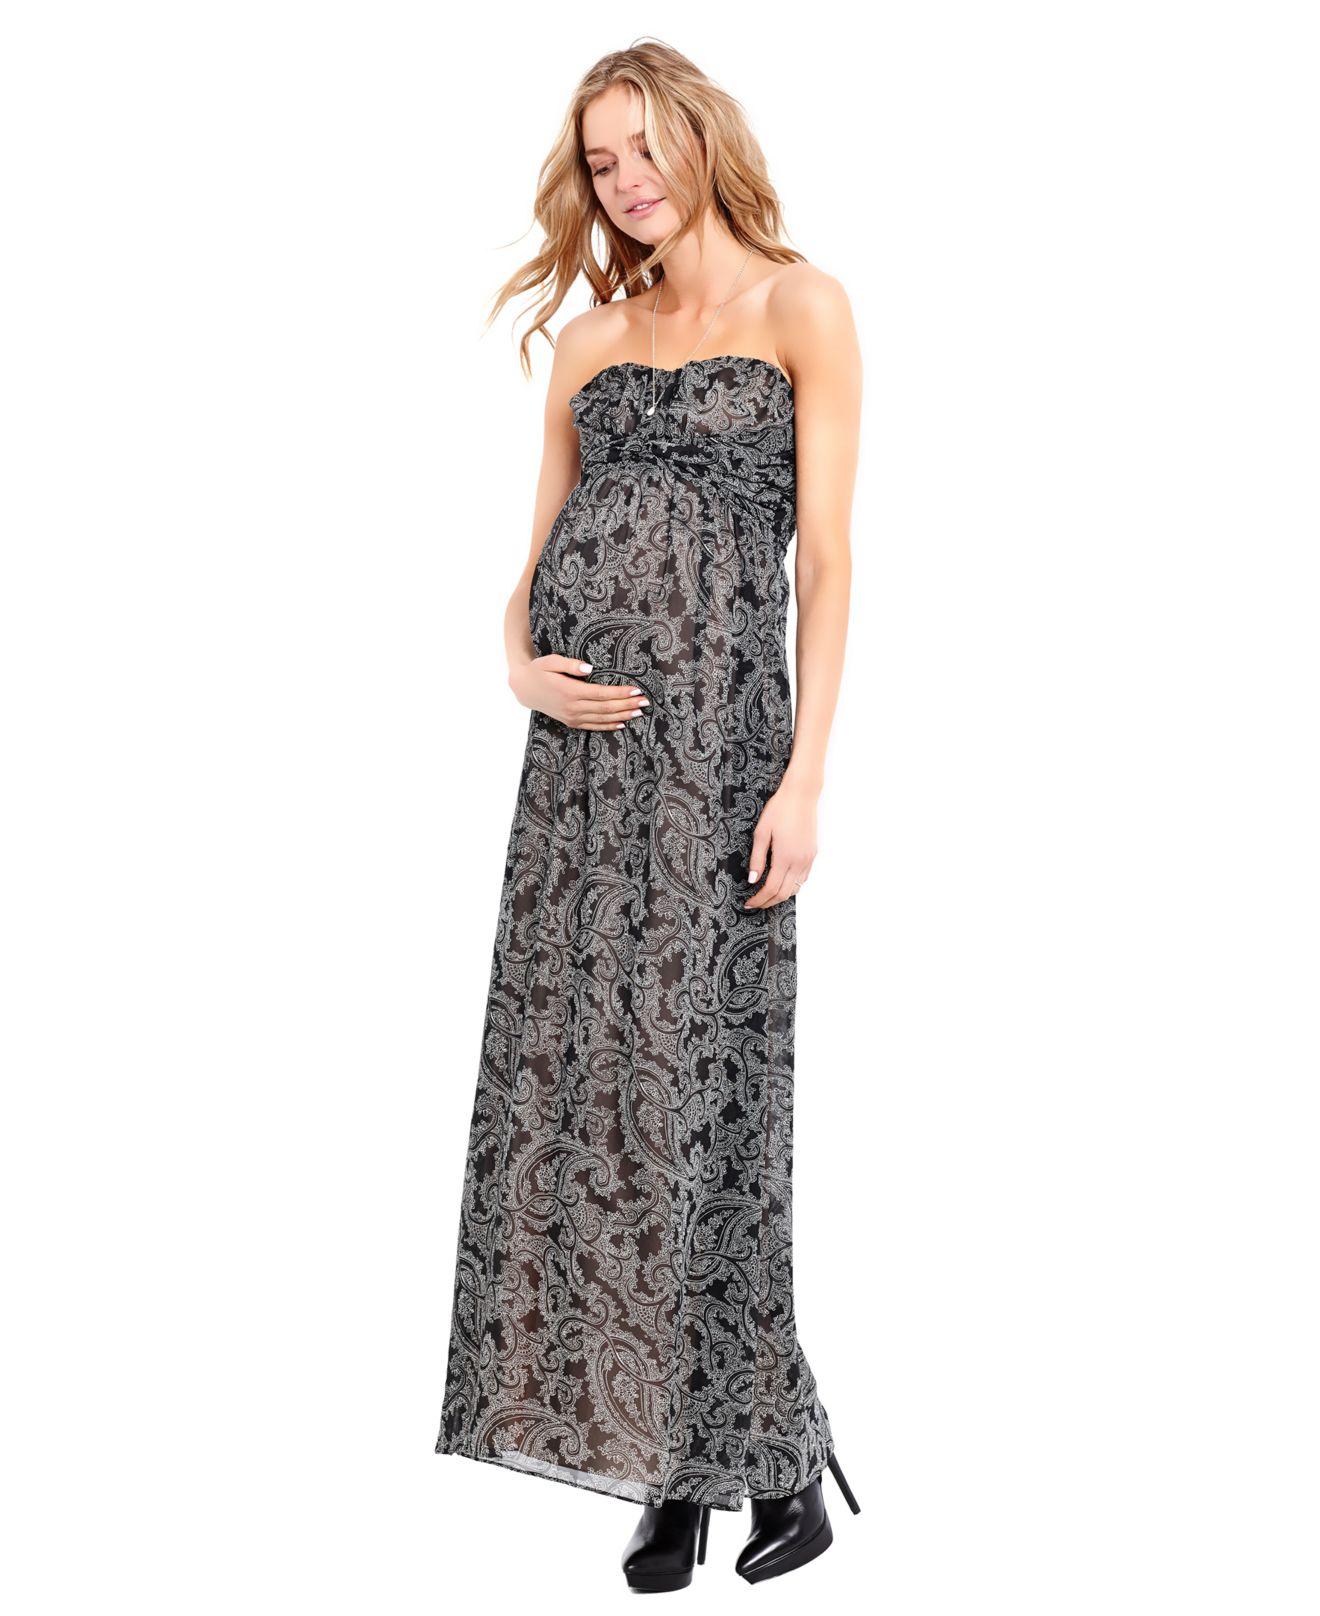 9d4acd2e25 Jessica Simpson Maternity Strapless Paisley-Print Maxi Dress - Lyst